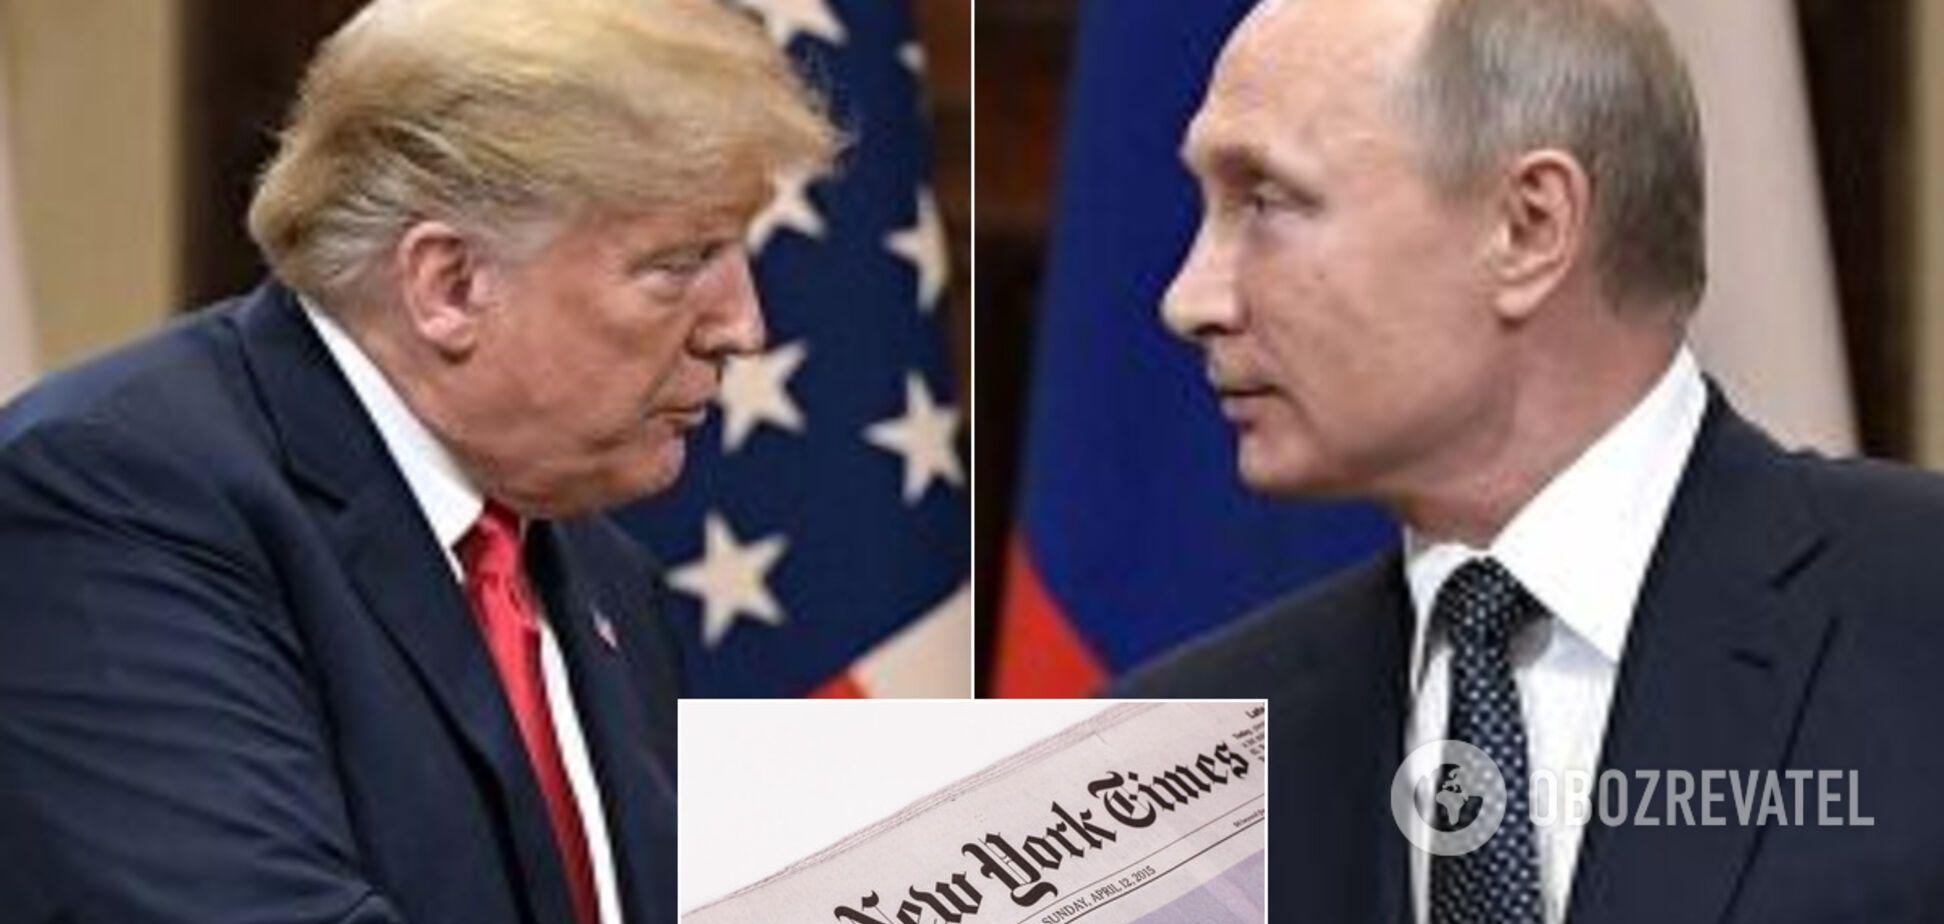 New York Times обвинила Трампа в связях с Россией: он нанес удар